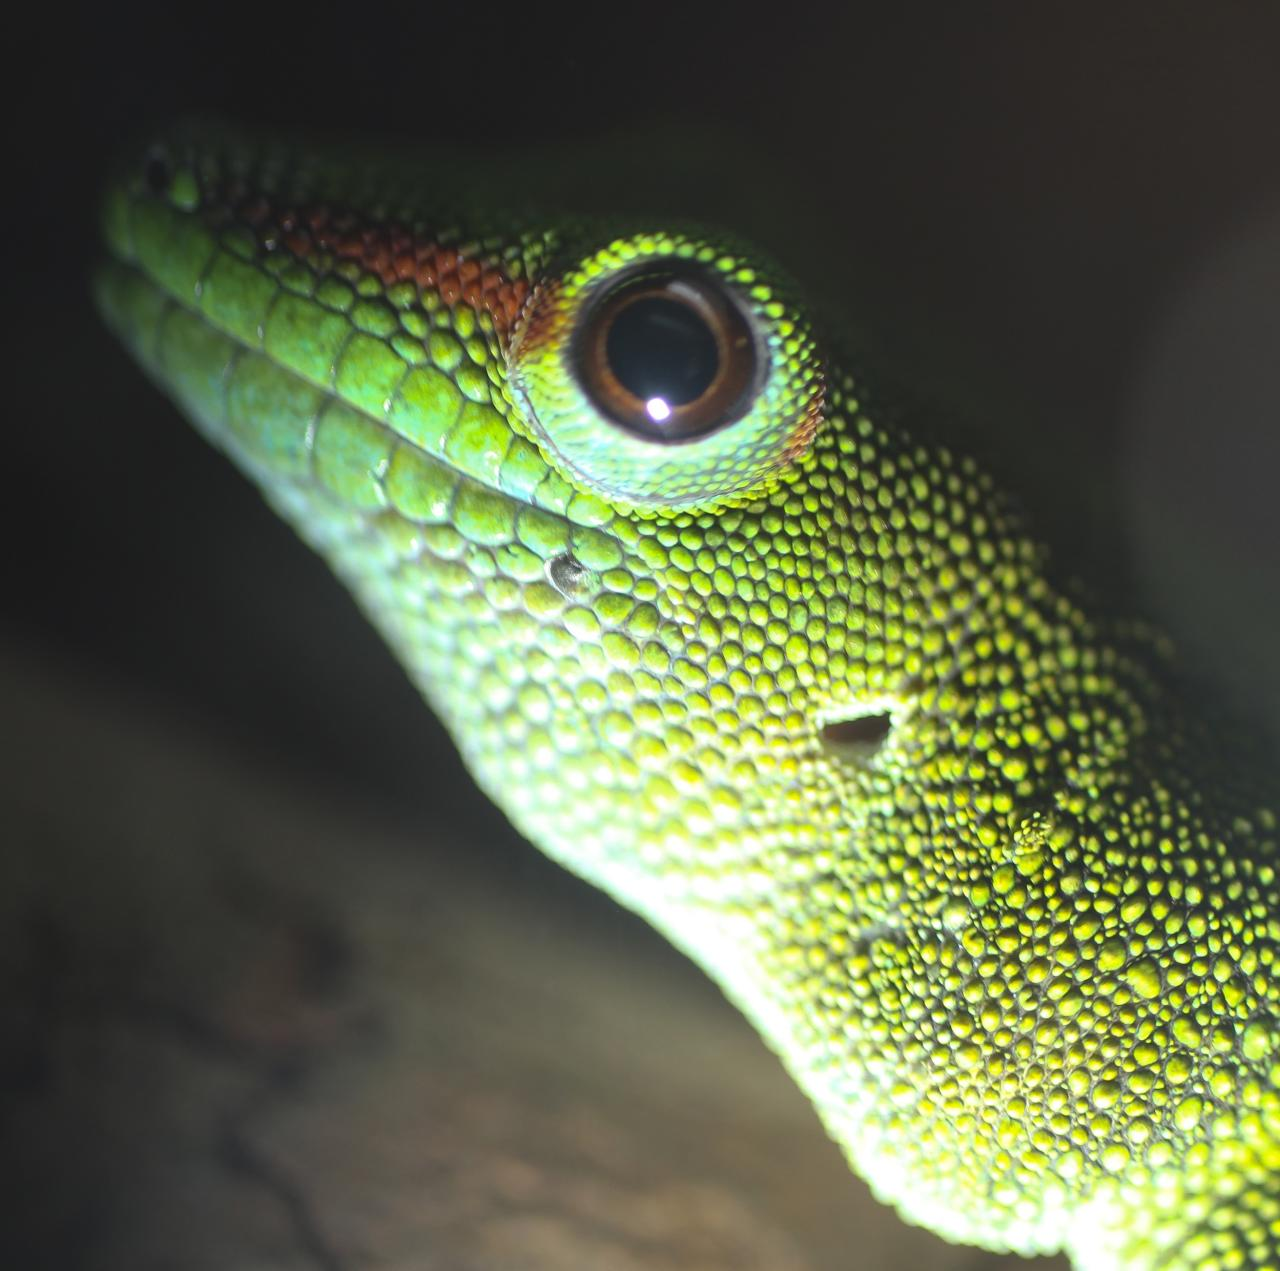 sinister-gecko-up-close_3243362783_o.jpg